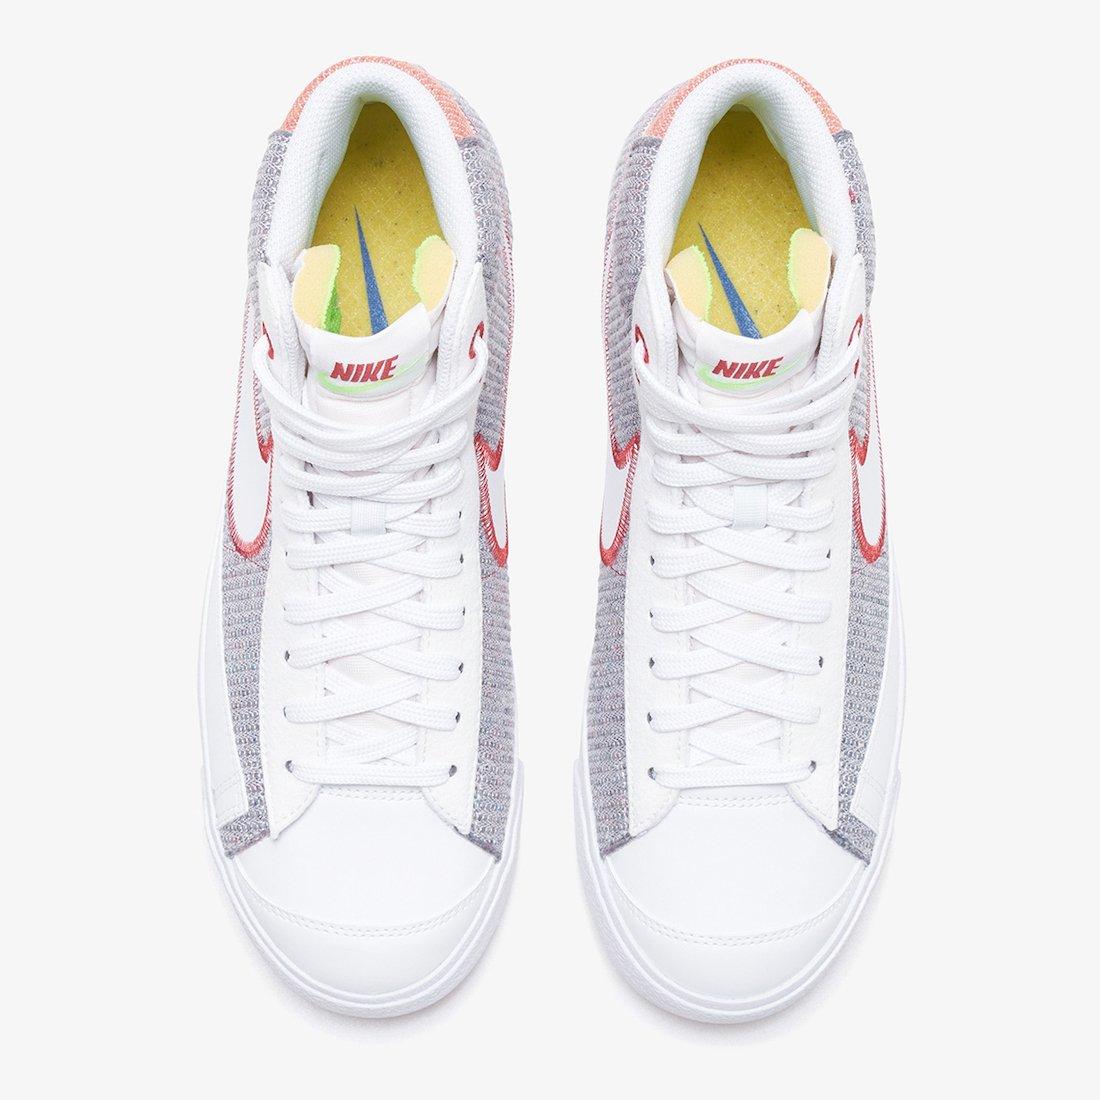 Nike Blazer Mid 77 Recycled CW5838-022 Release Date Info